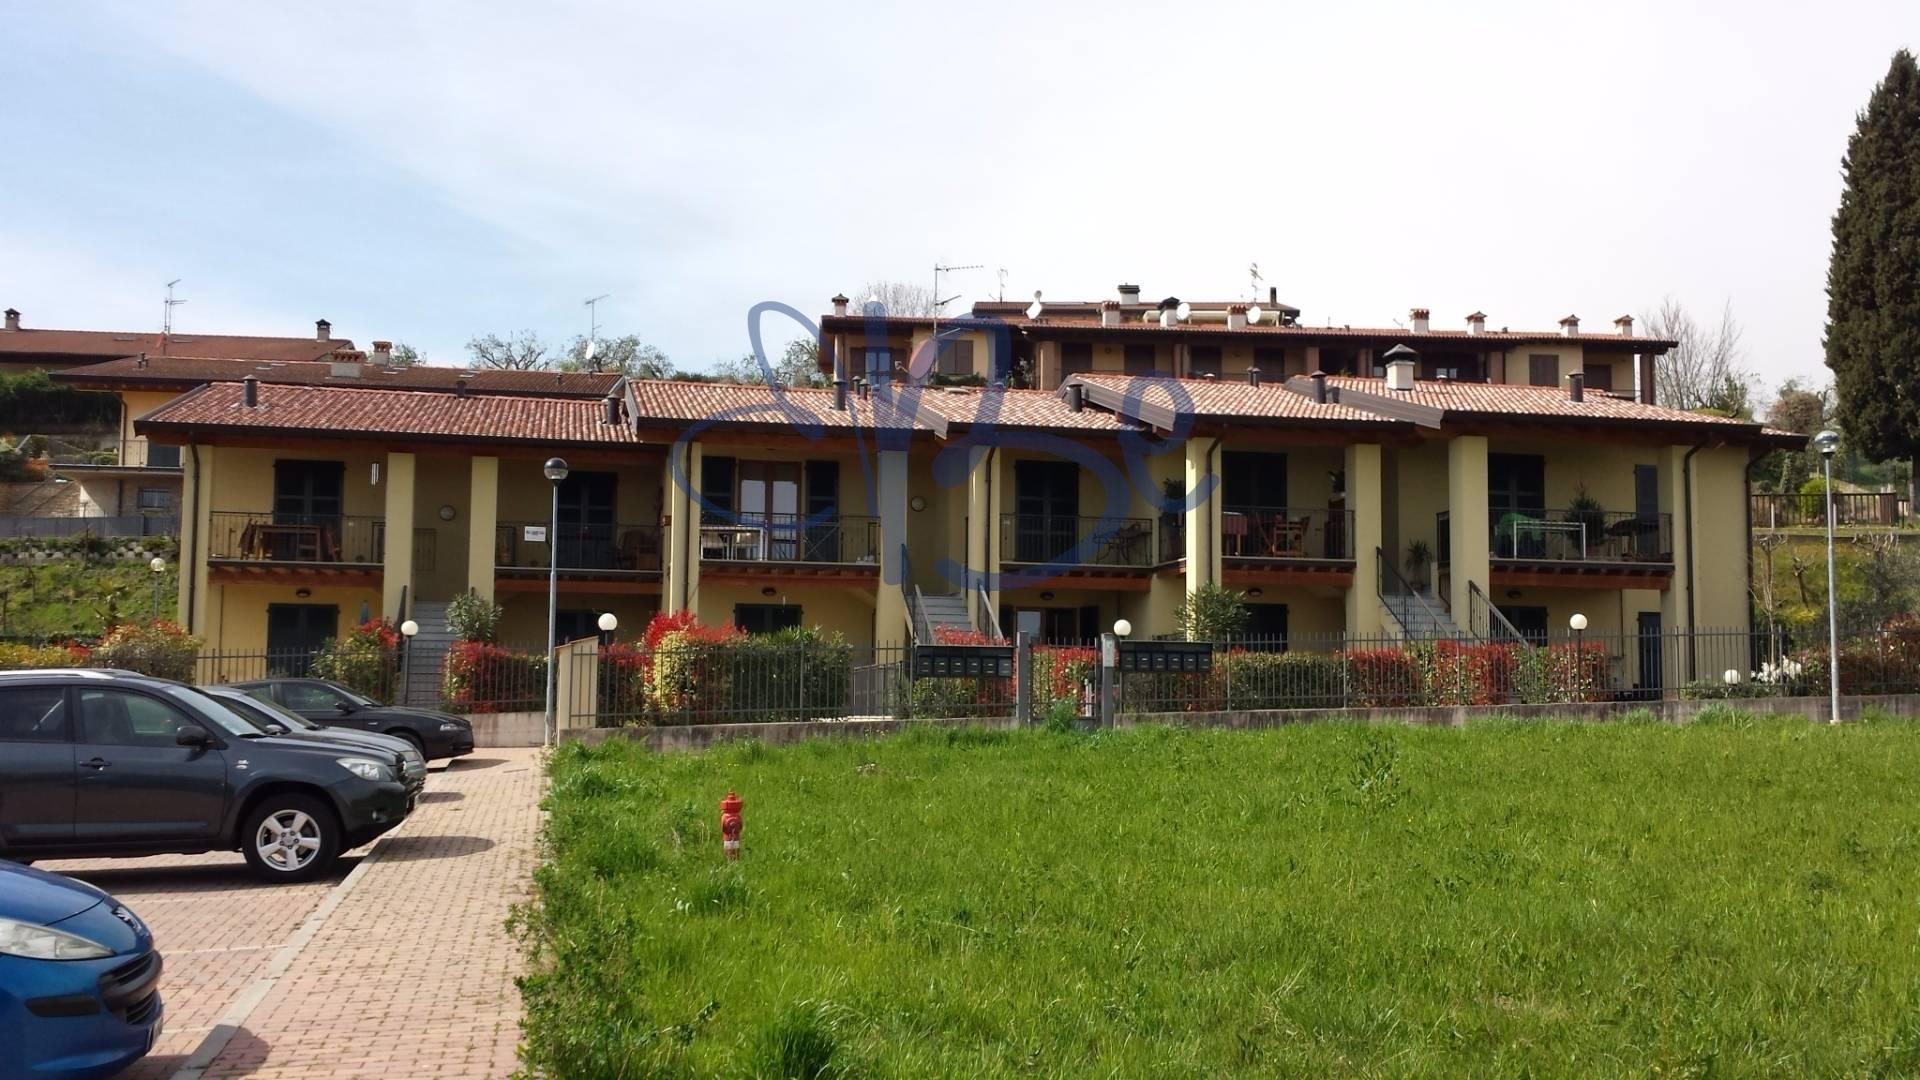 Bilocale Puegnago sul Garda Via Predefitte 1